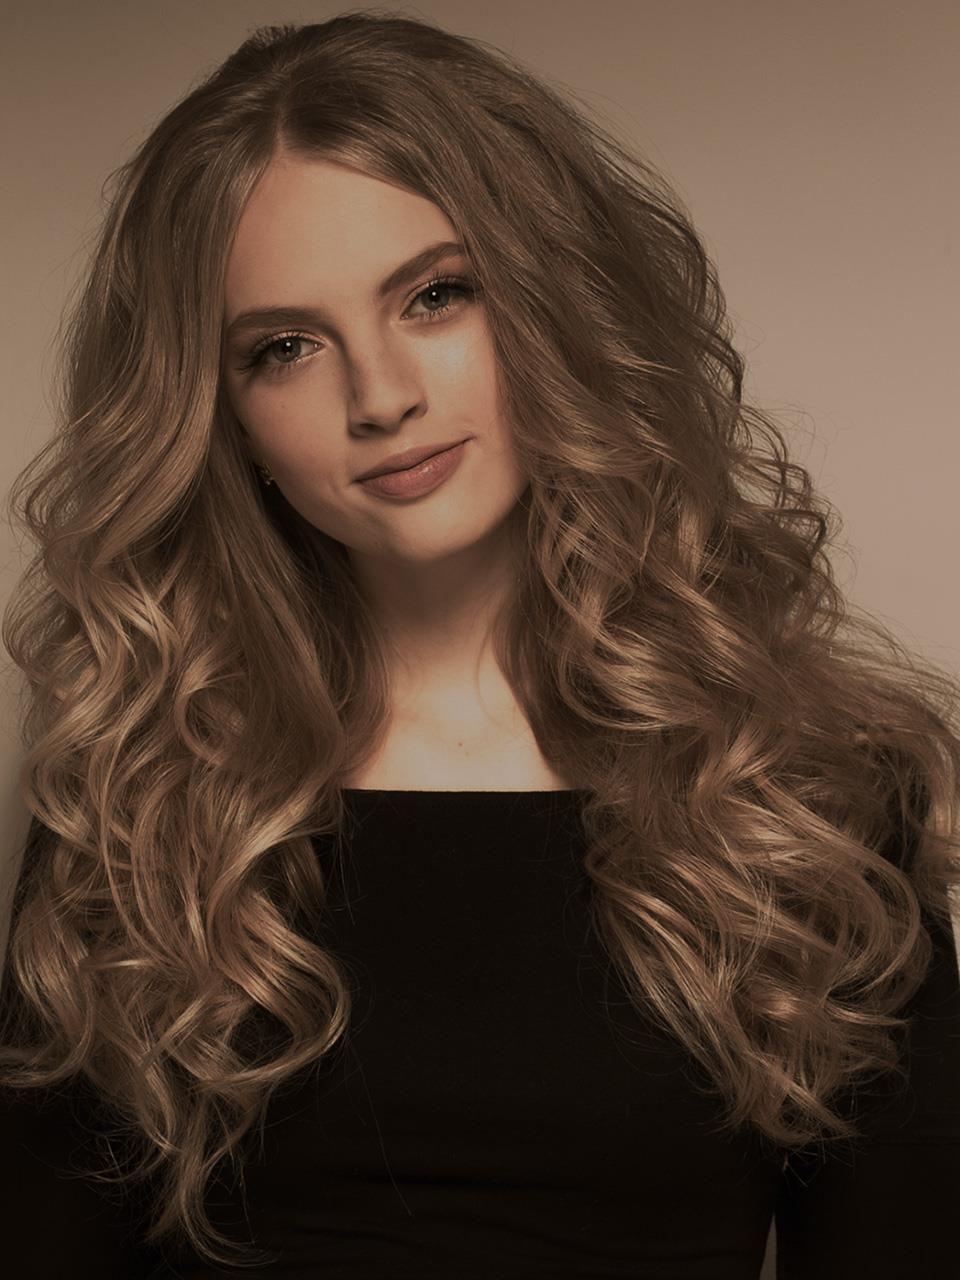 Hair Care Tips as You Age Hair styles, Hair, Long hair